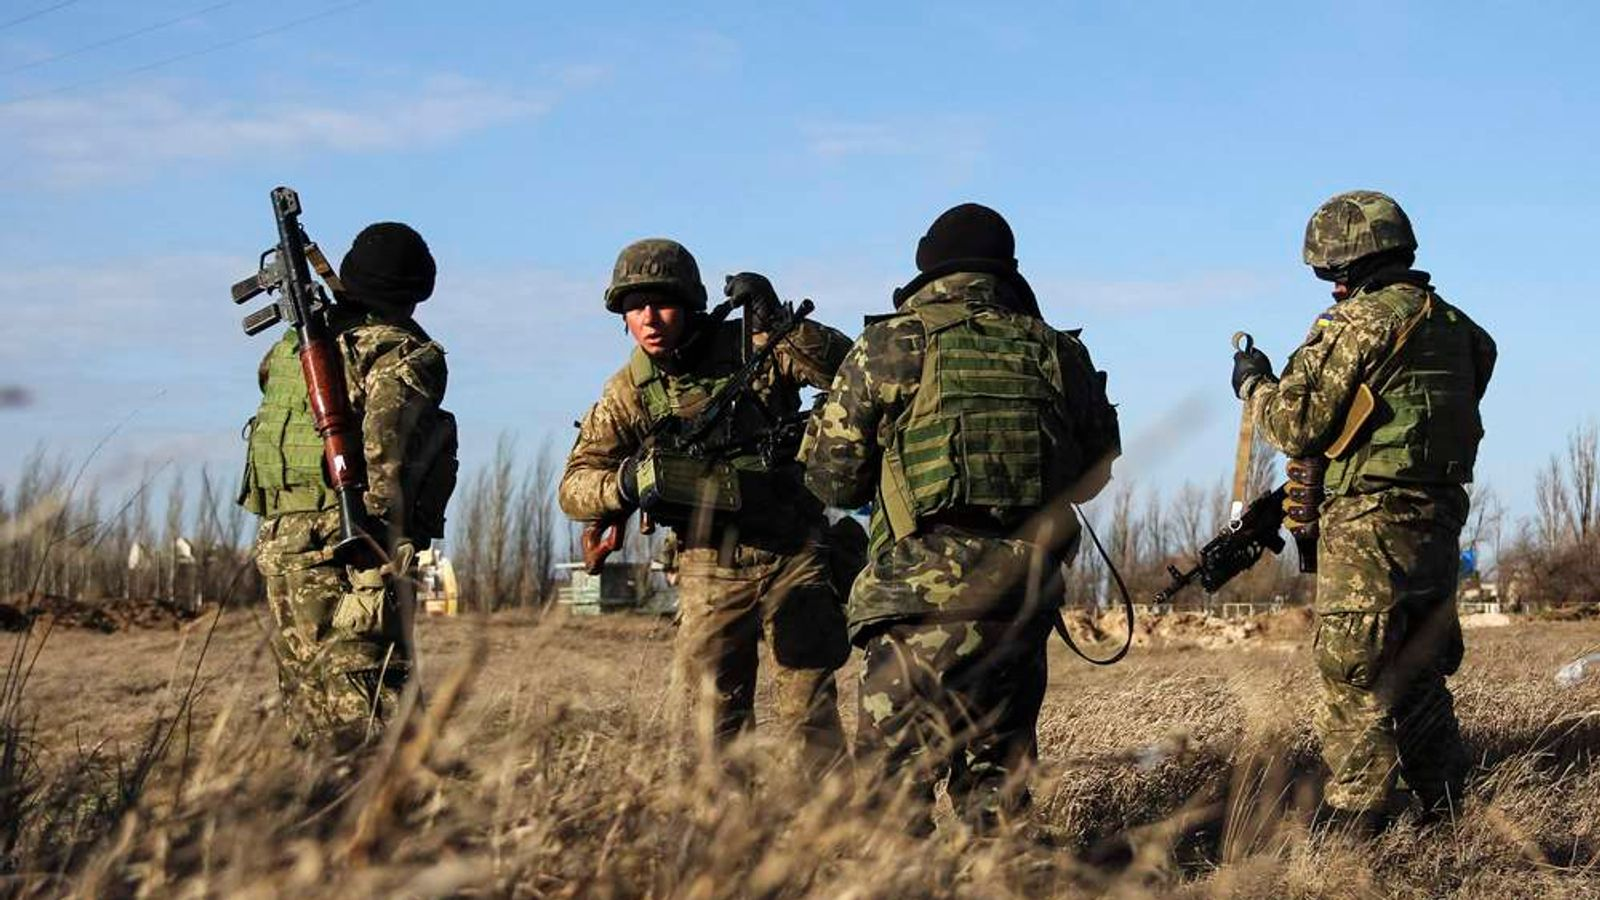 Ukrainian servicemen guard a checkpoint near the village of Strelkovo in Kherson region adjacent to Crimea